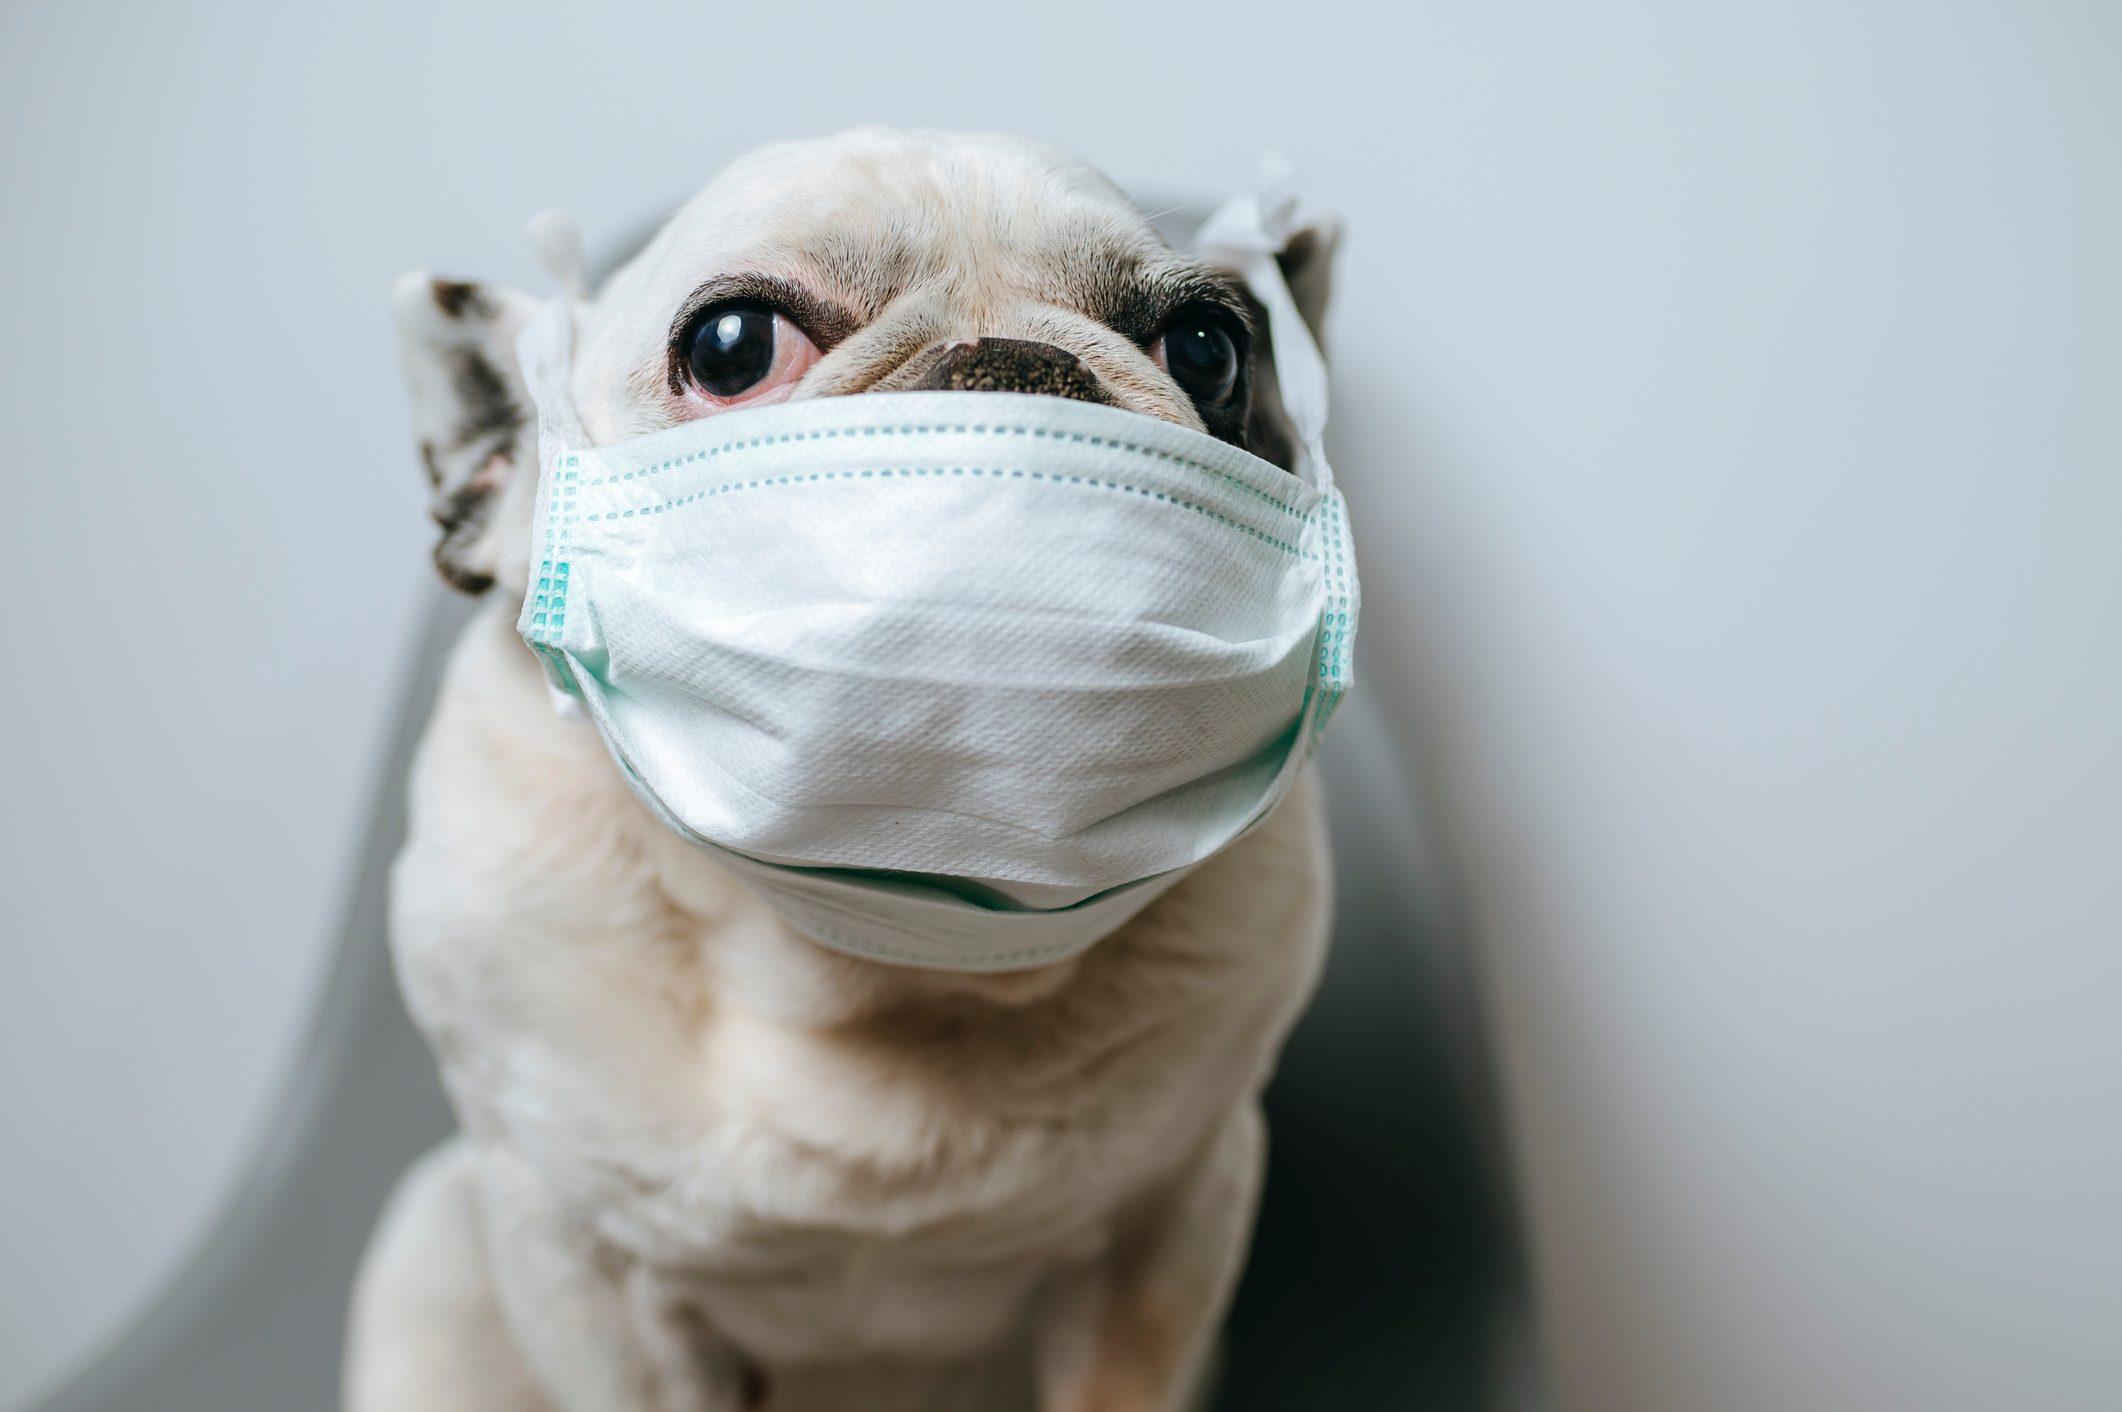 Dog with medical mask